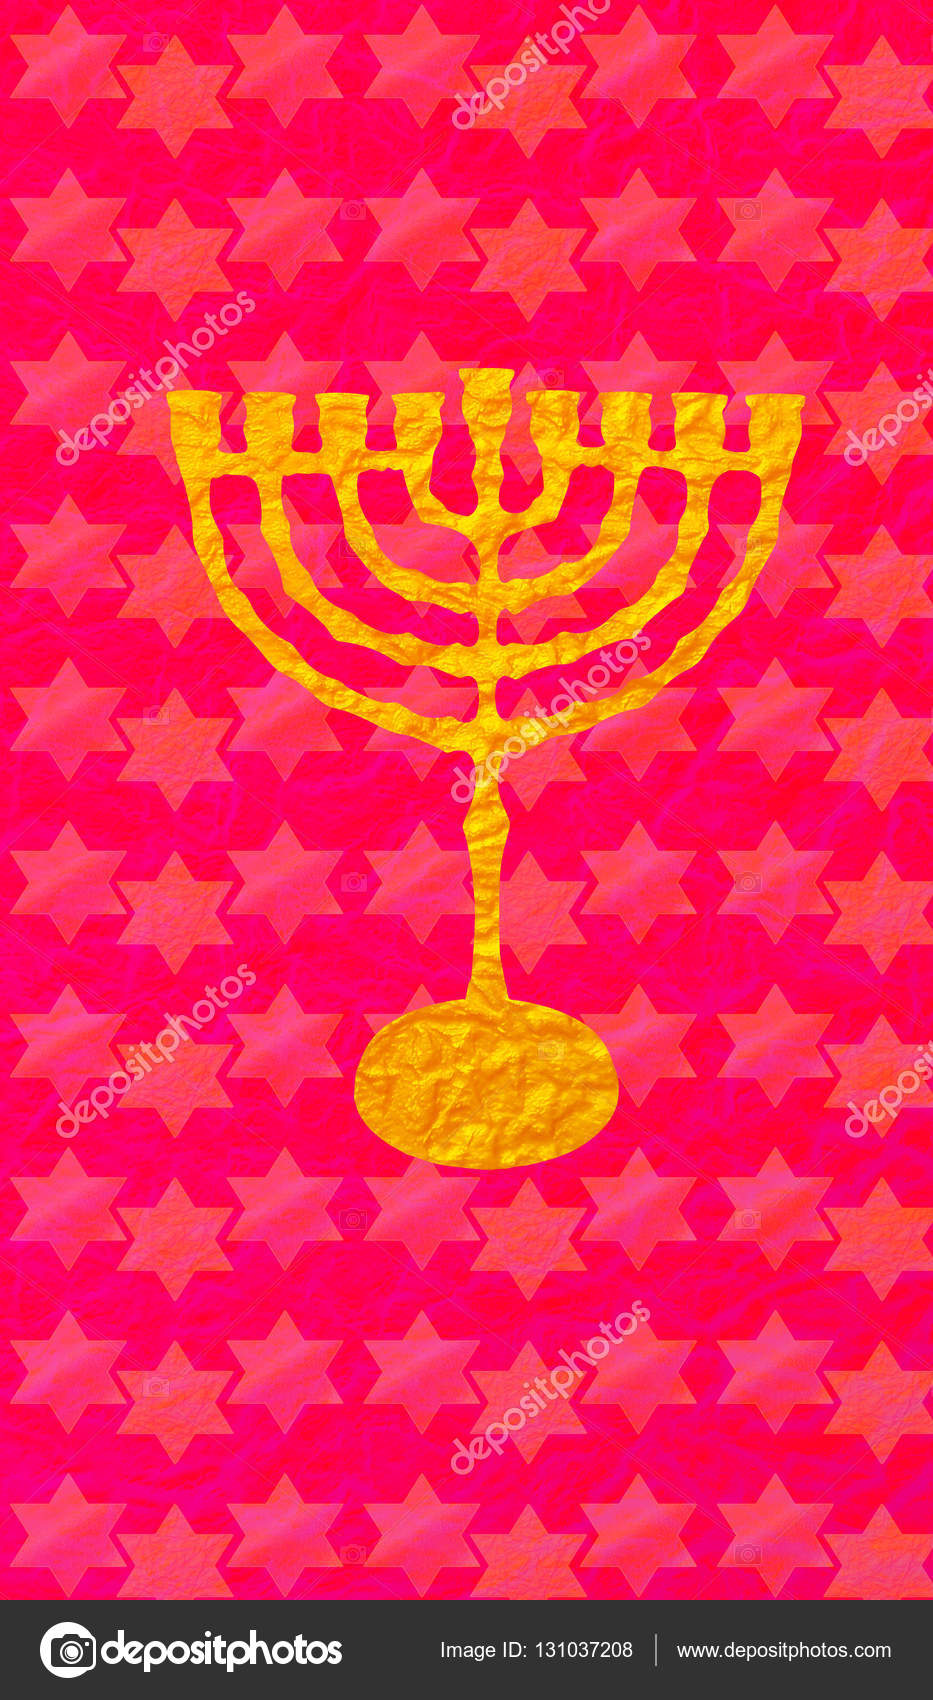 Hanukkah Festival Of Lights Jewish Holiday Menorah Traditional Candelabra For Candles